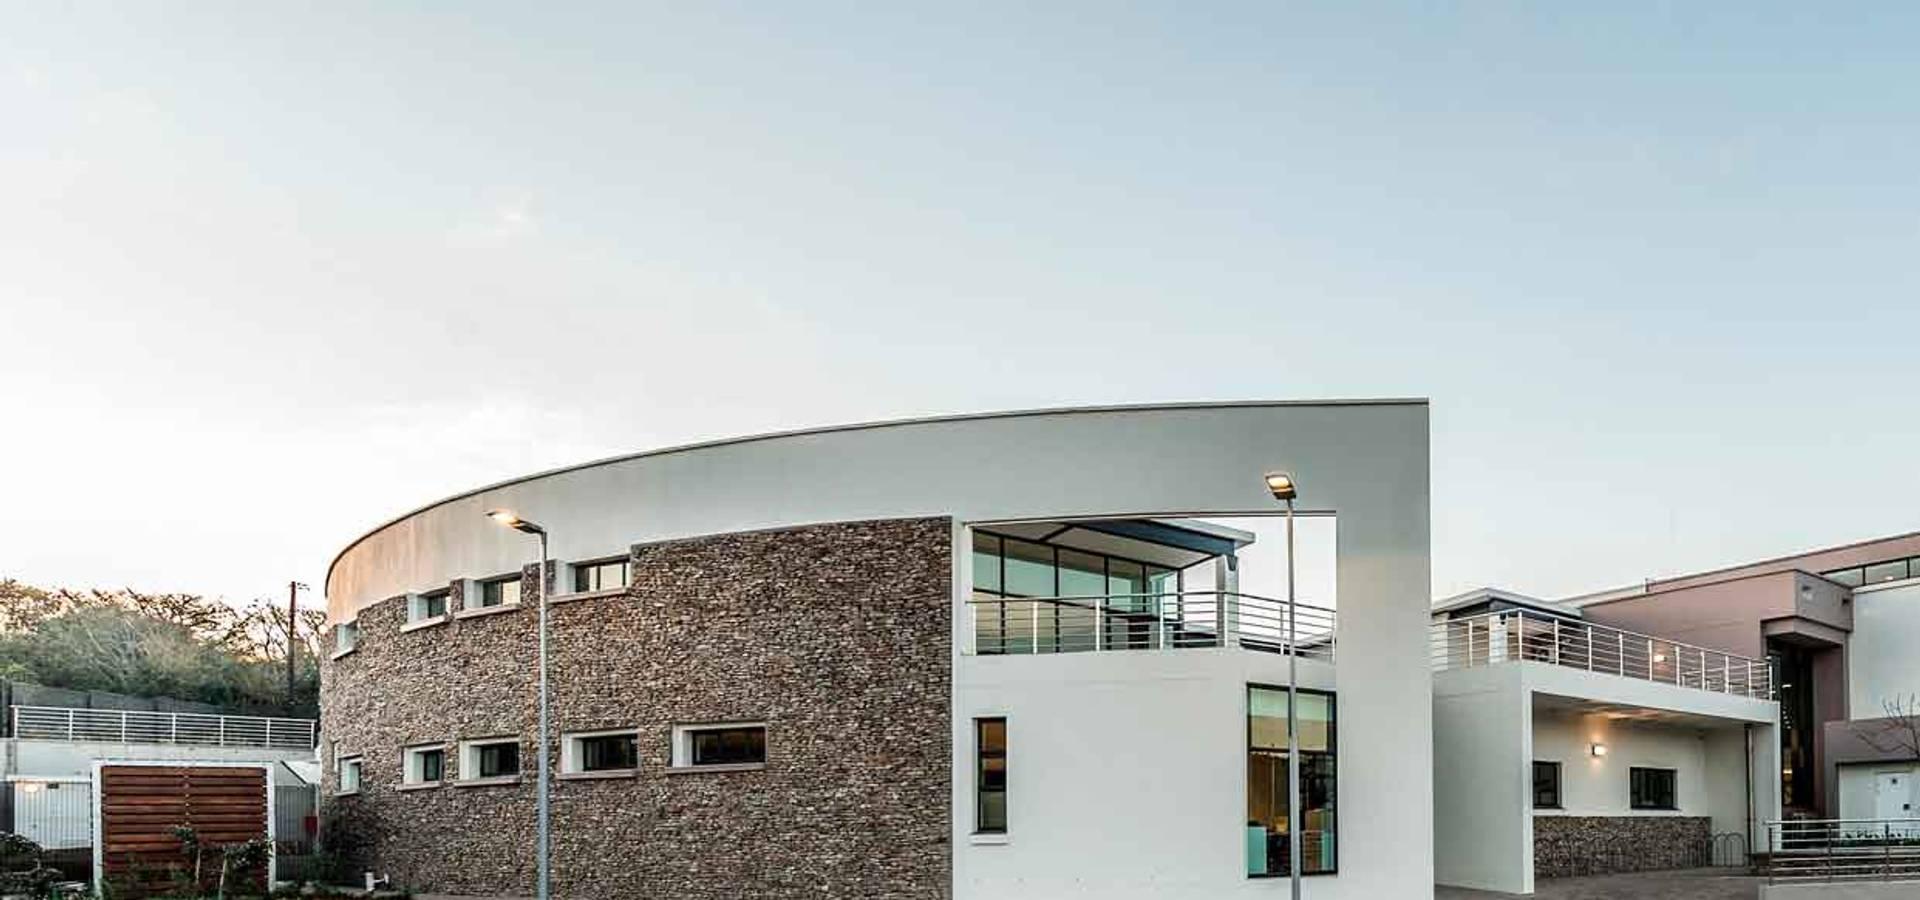 Intsika Architects (Pty) Ltd